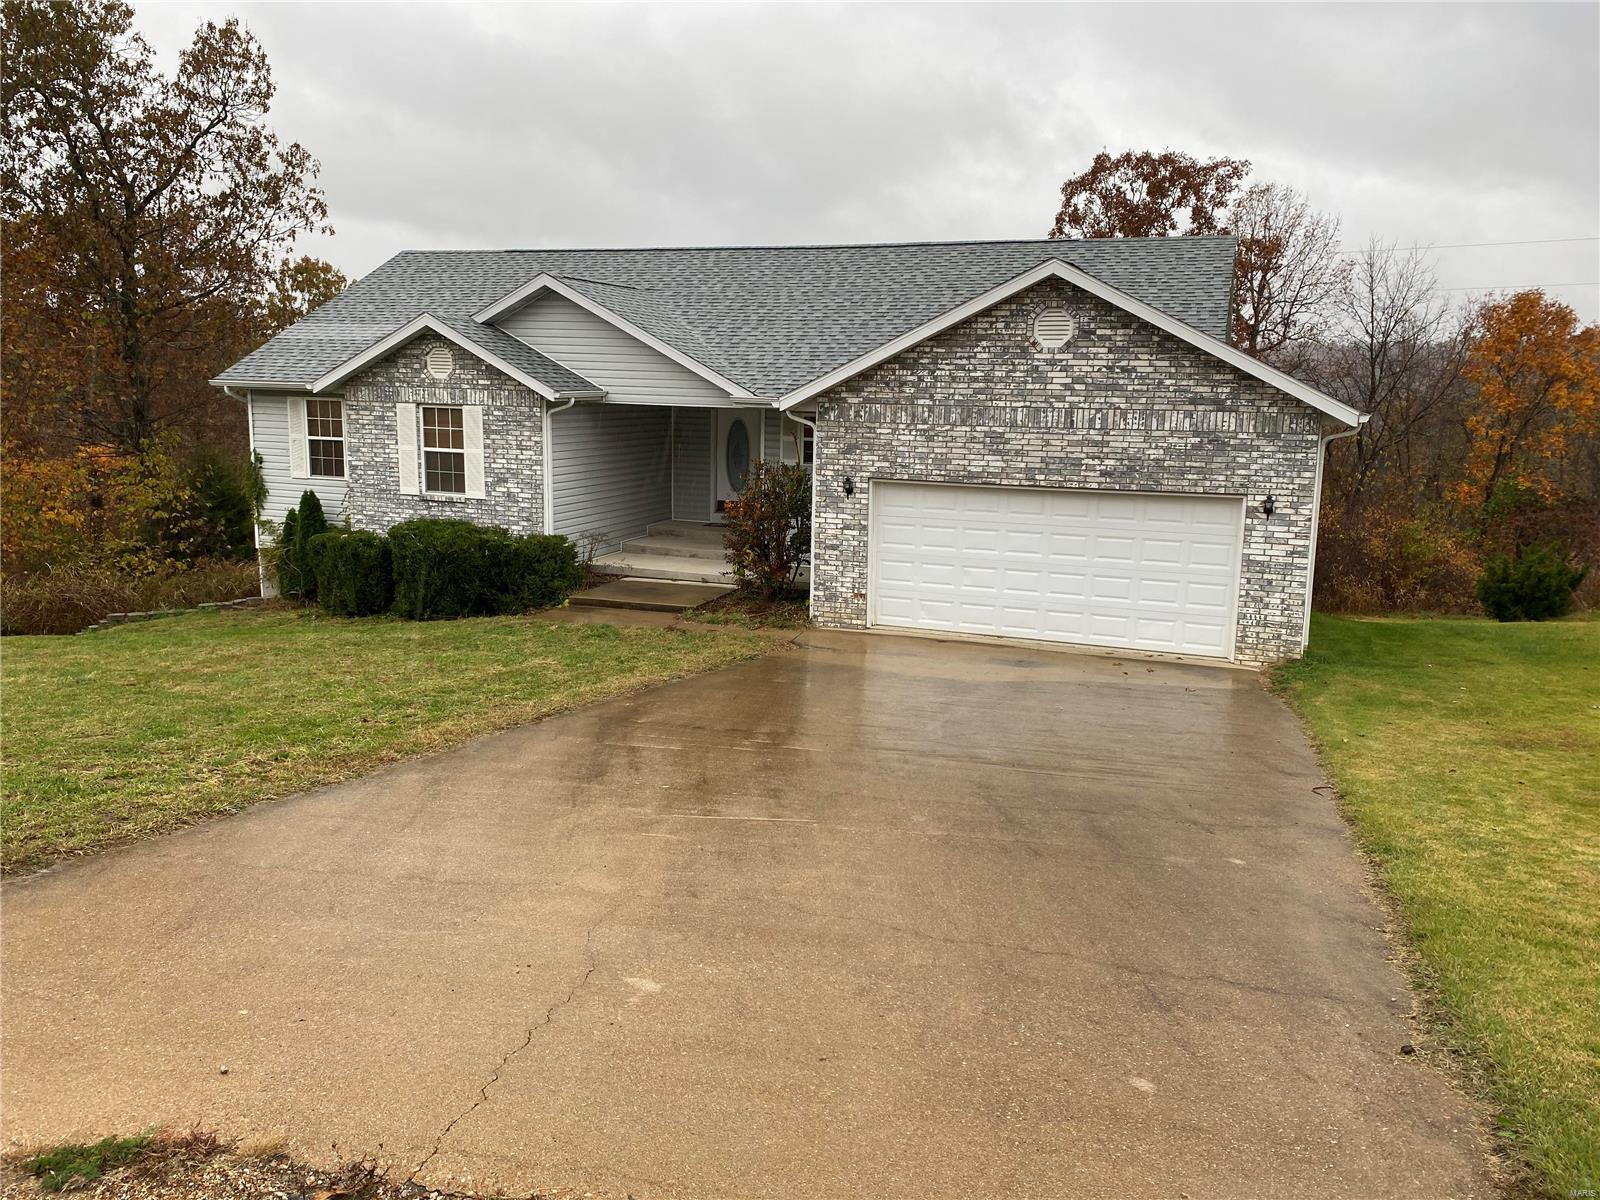 14485 Harper Property Photo - Dixon, MO real estate listing